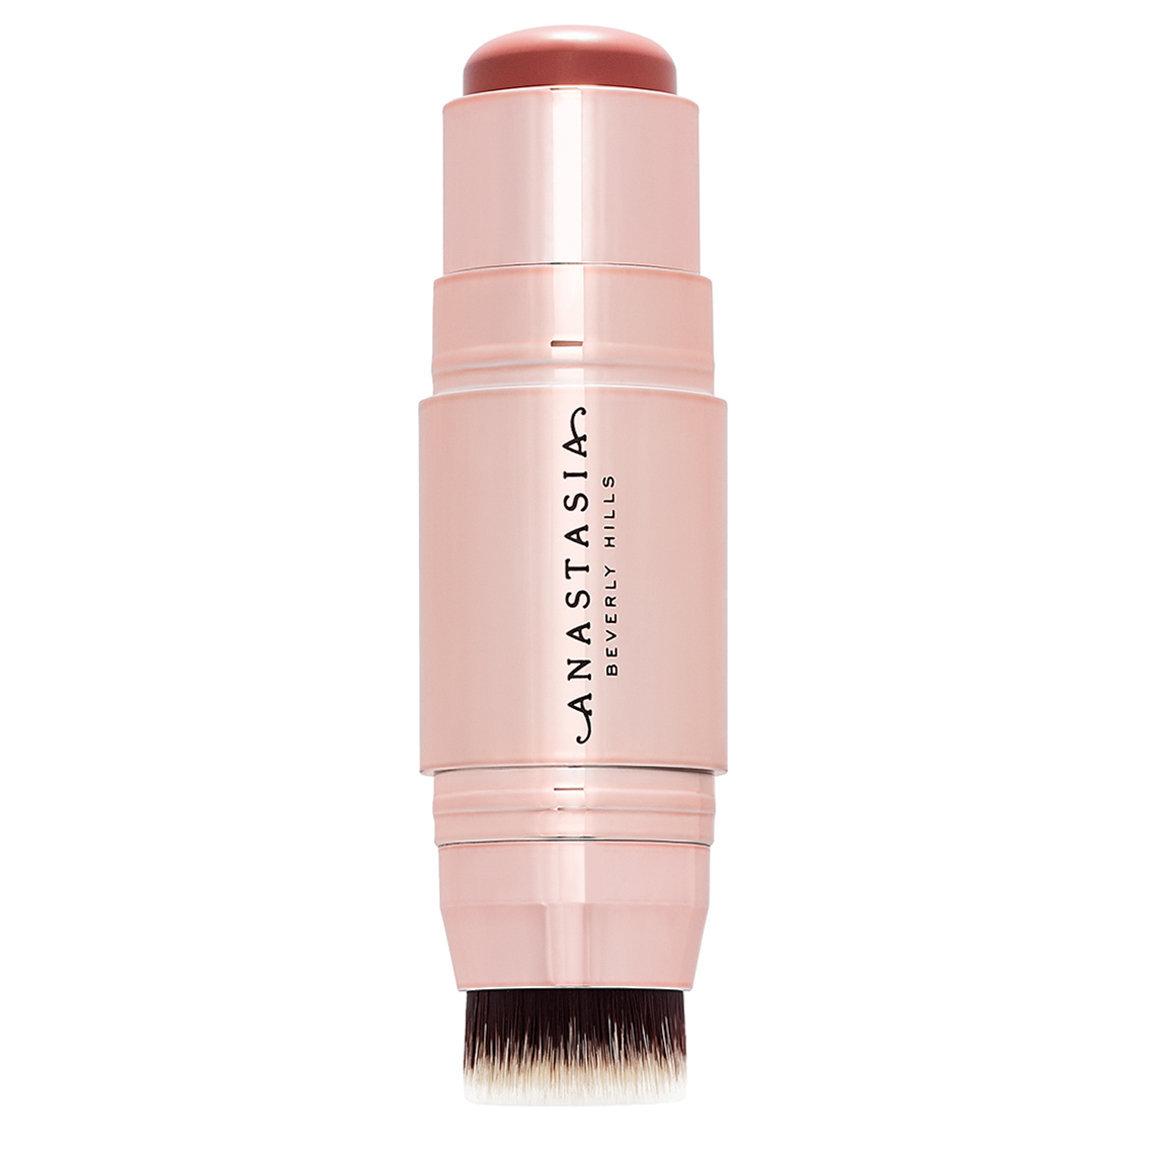 Anastasia Beverly Hills Stick Blush Soft Rose alternative view 1.